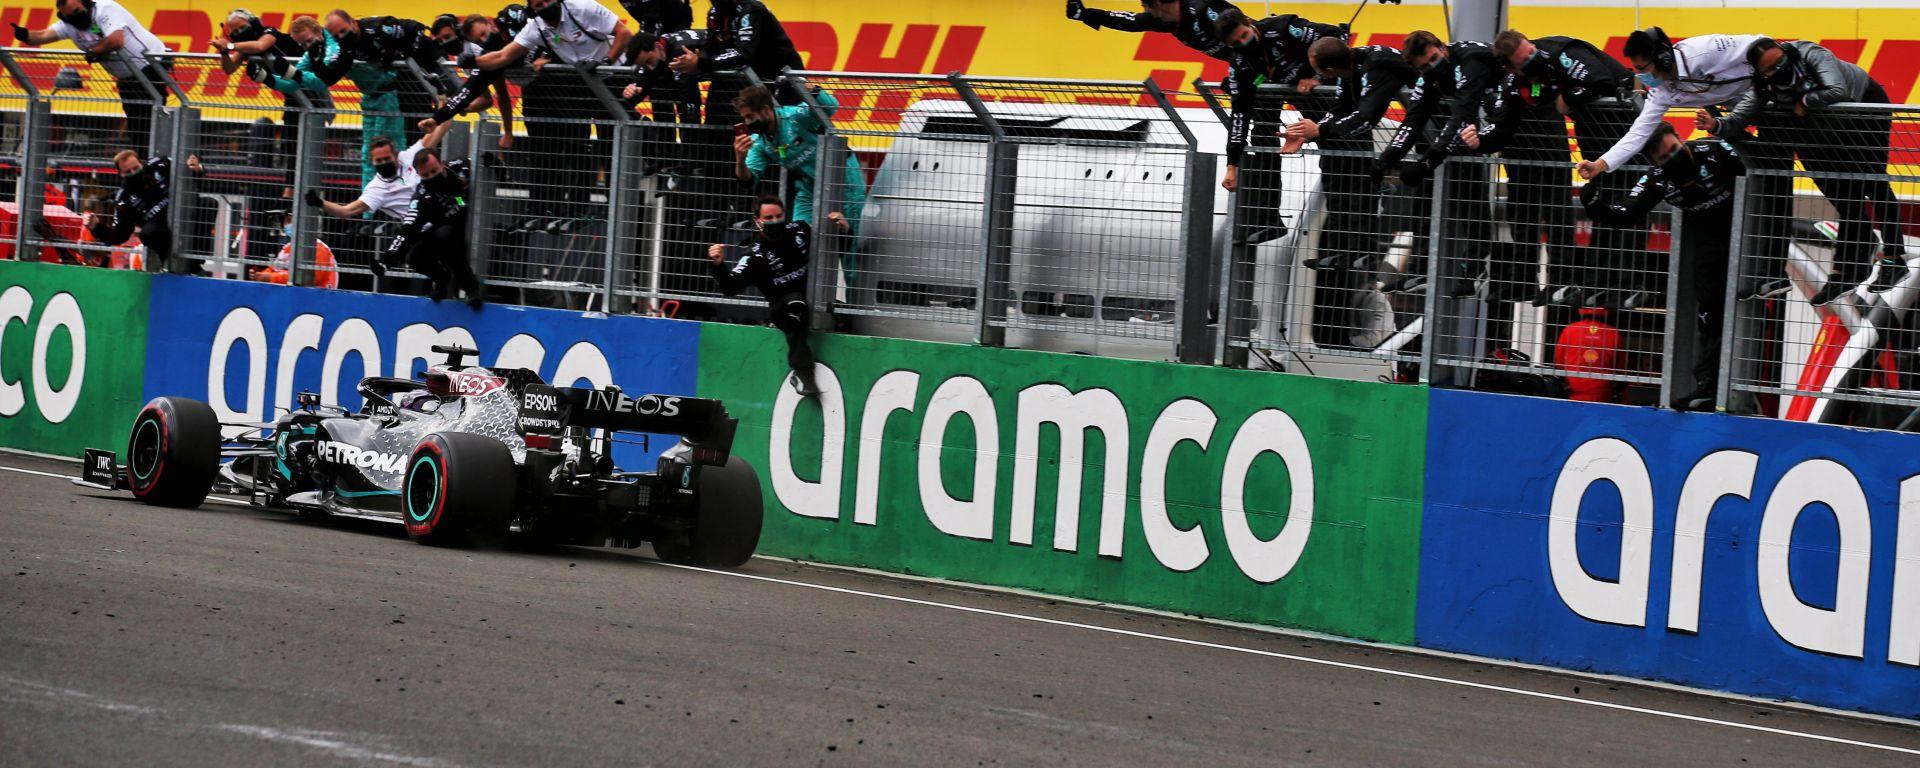 F1 GP Ungheria 2020, Budapest: Lewis Hamilton (Mercedes) taglia il traguardo